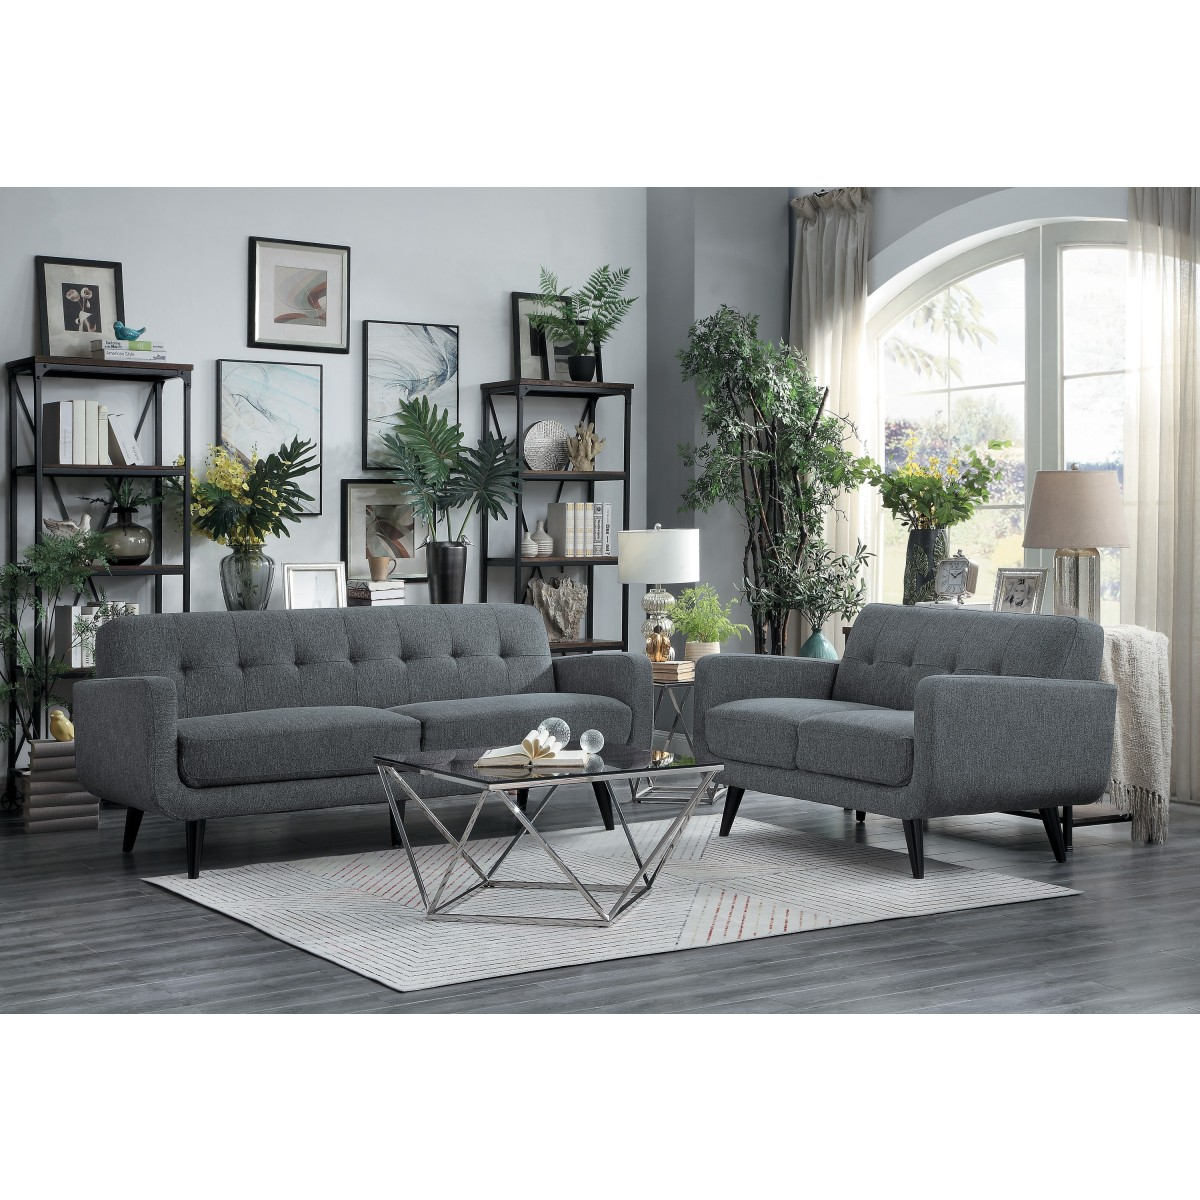 2PC set (sofa + Loveseat)